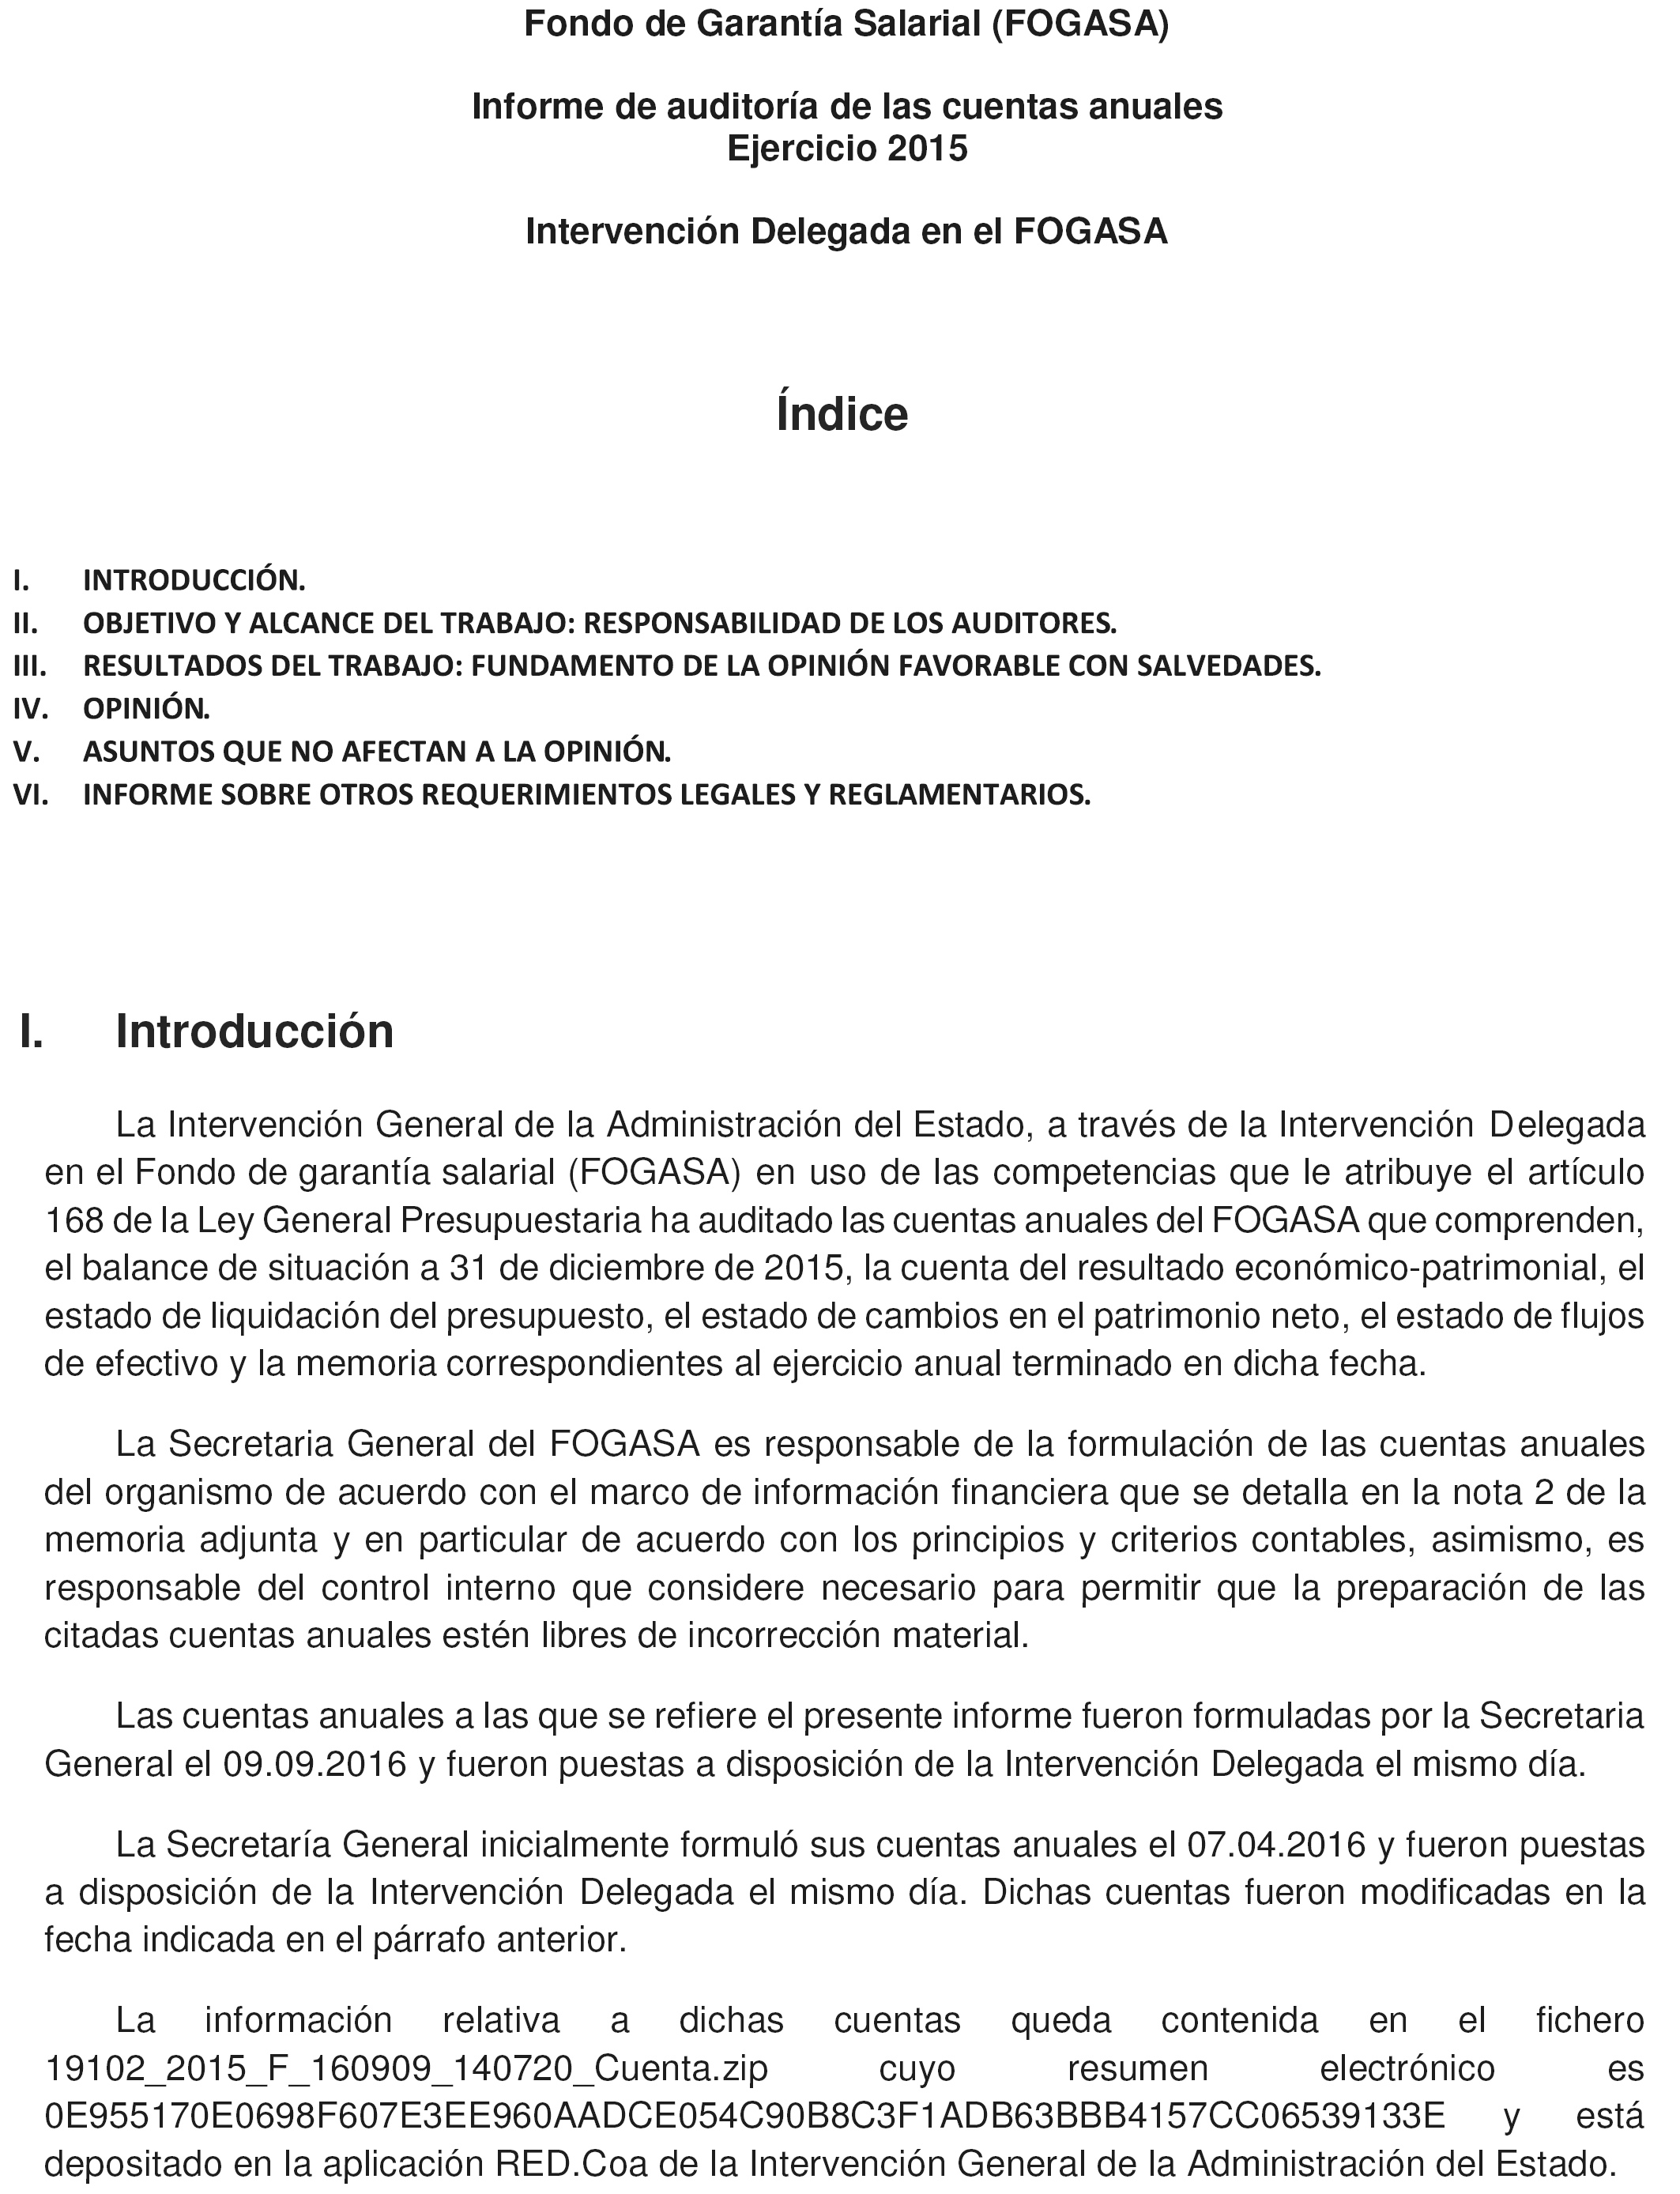 BOE.es - Documento BOE-A-2016-12257